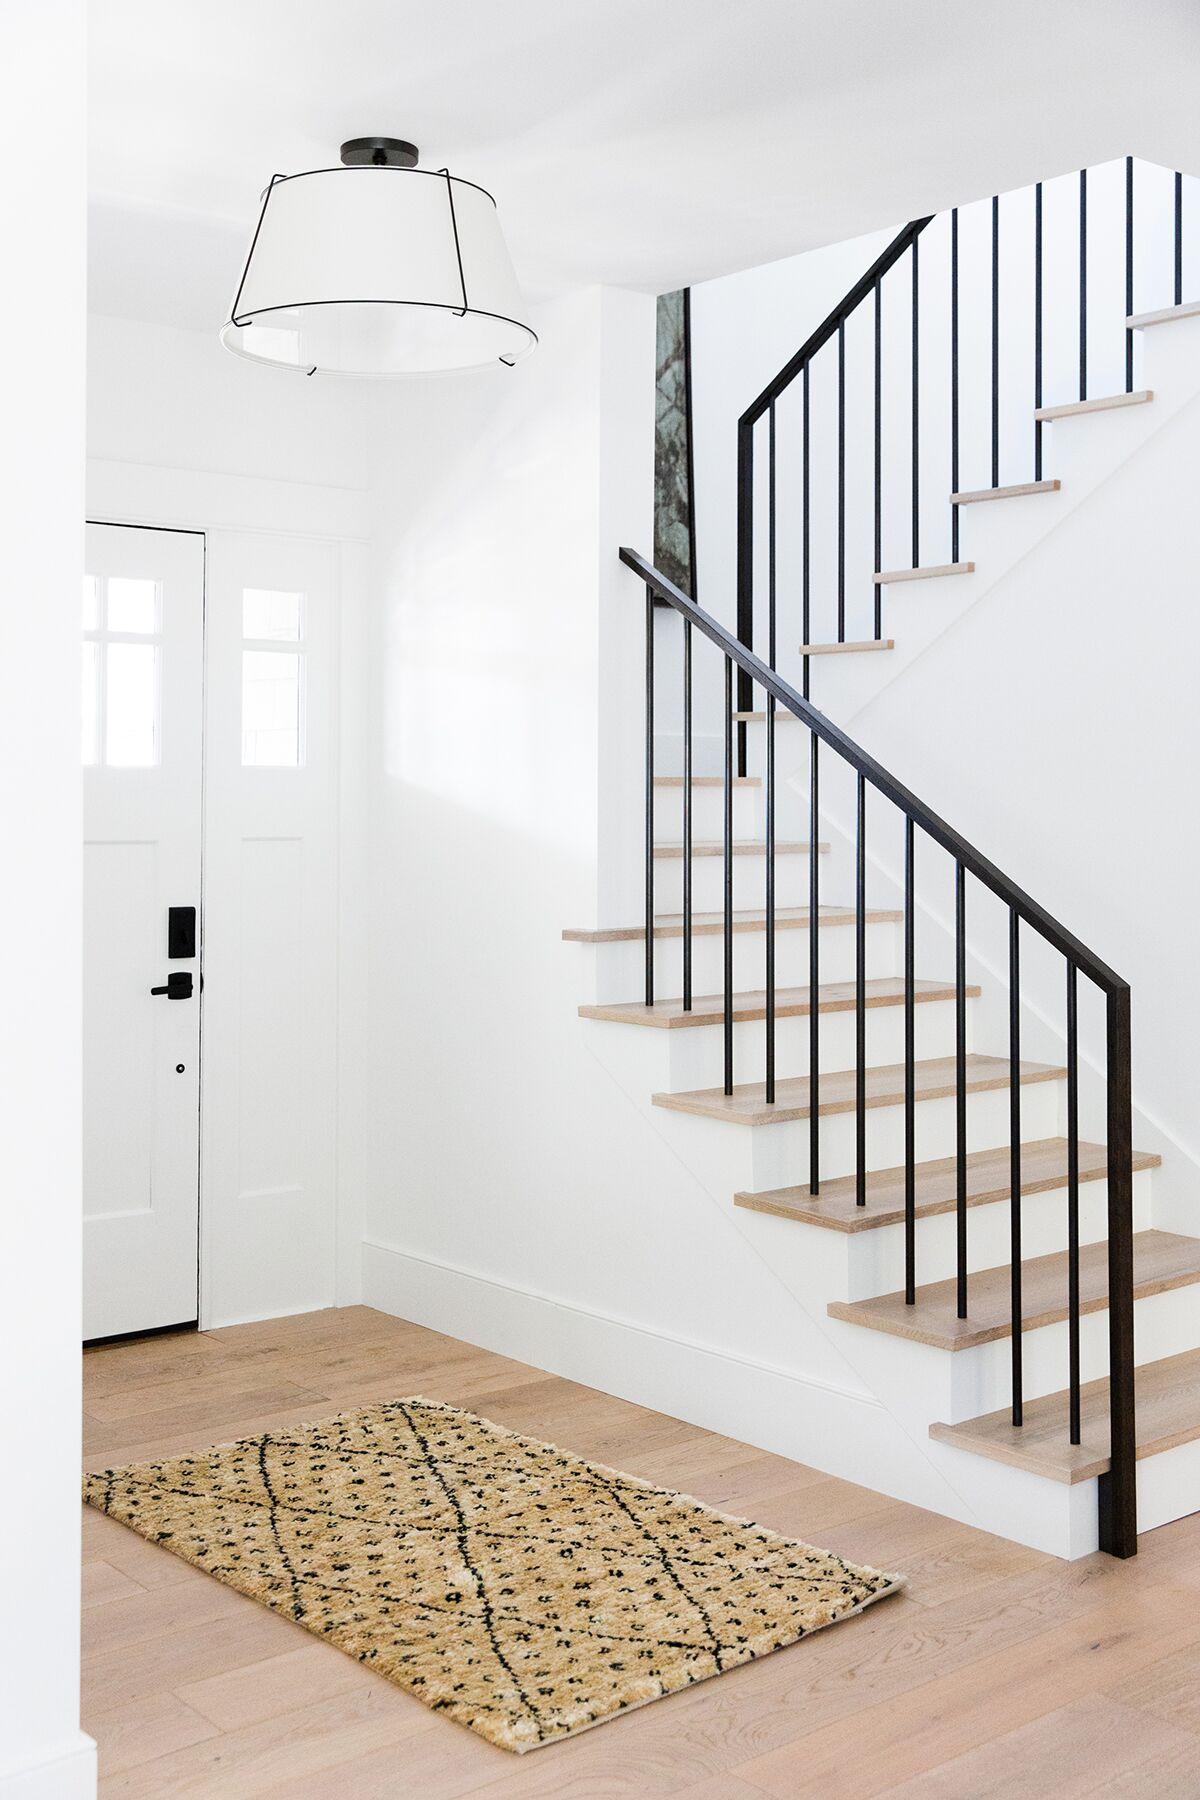 Studio McGee stairwell envy